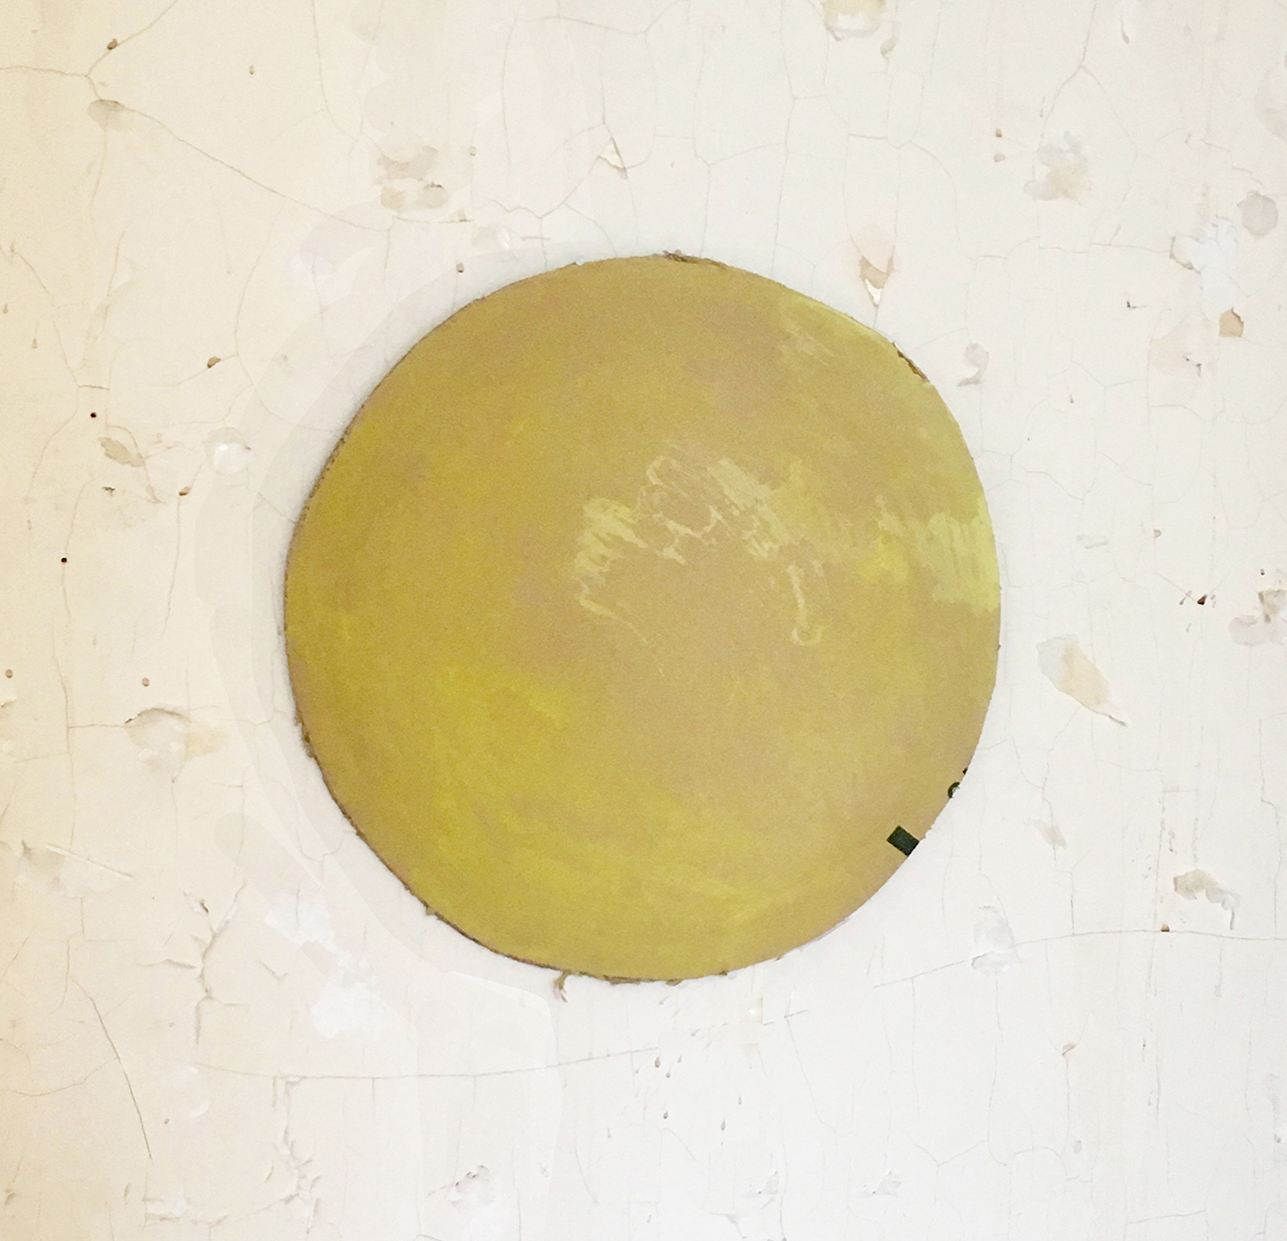 yellow_sun_1500_square.jpg